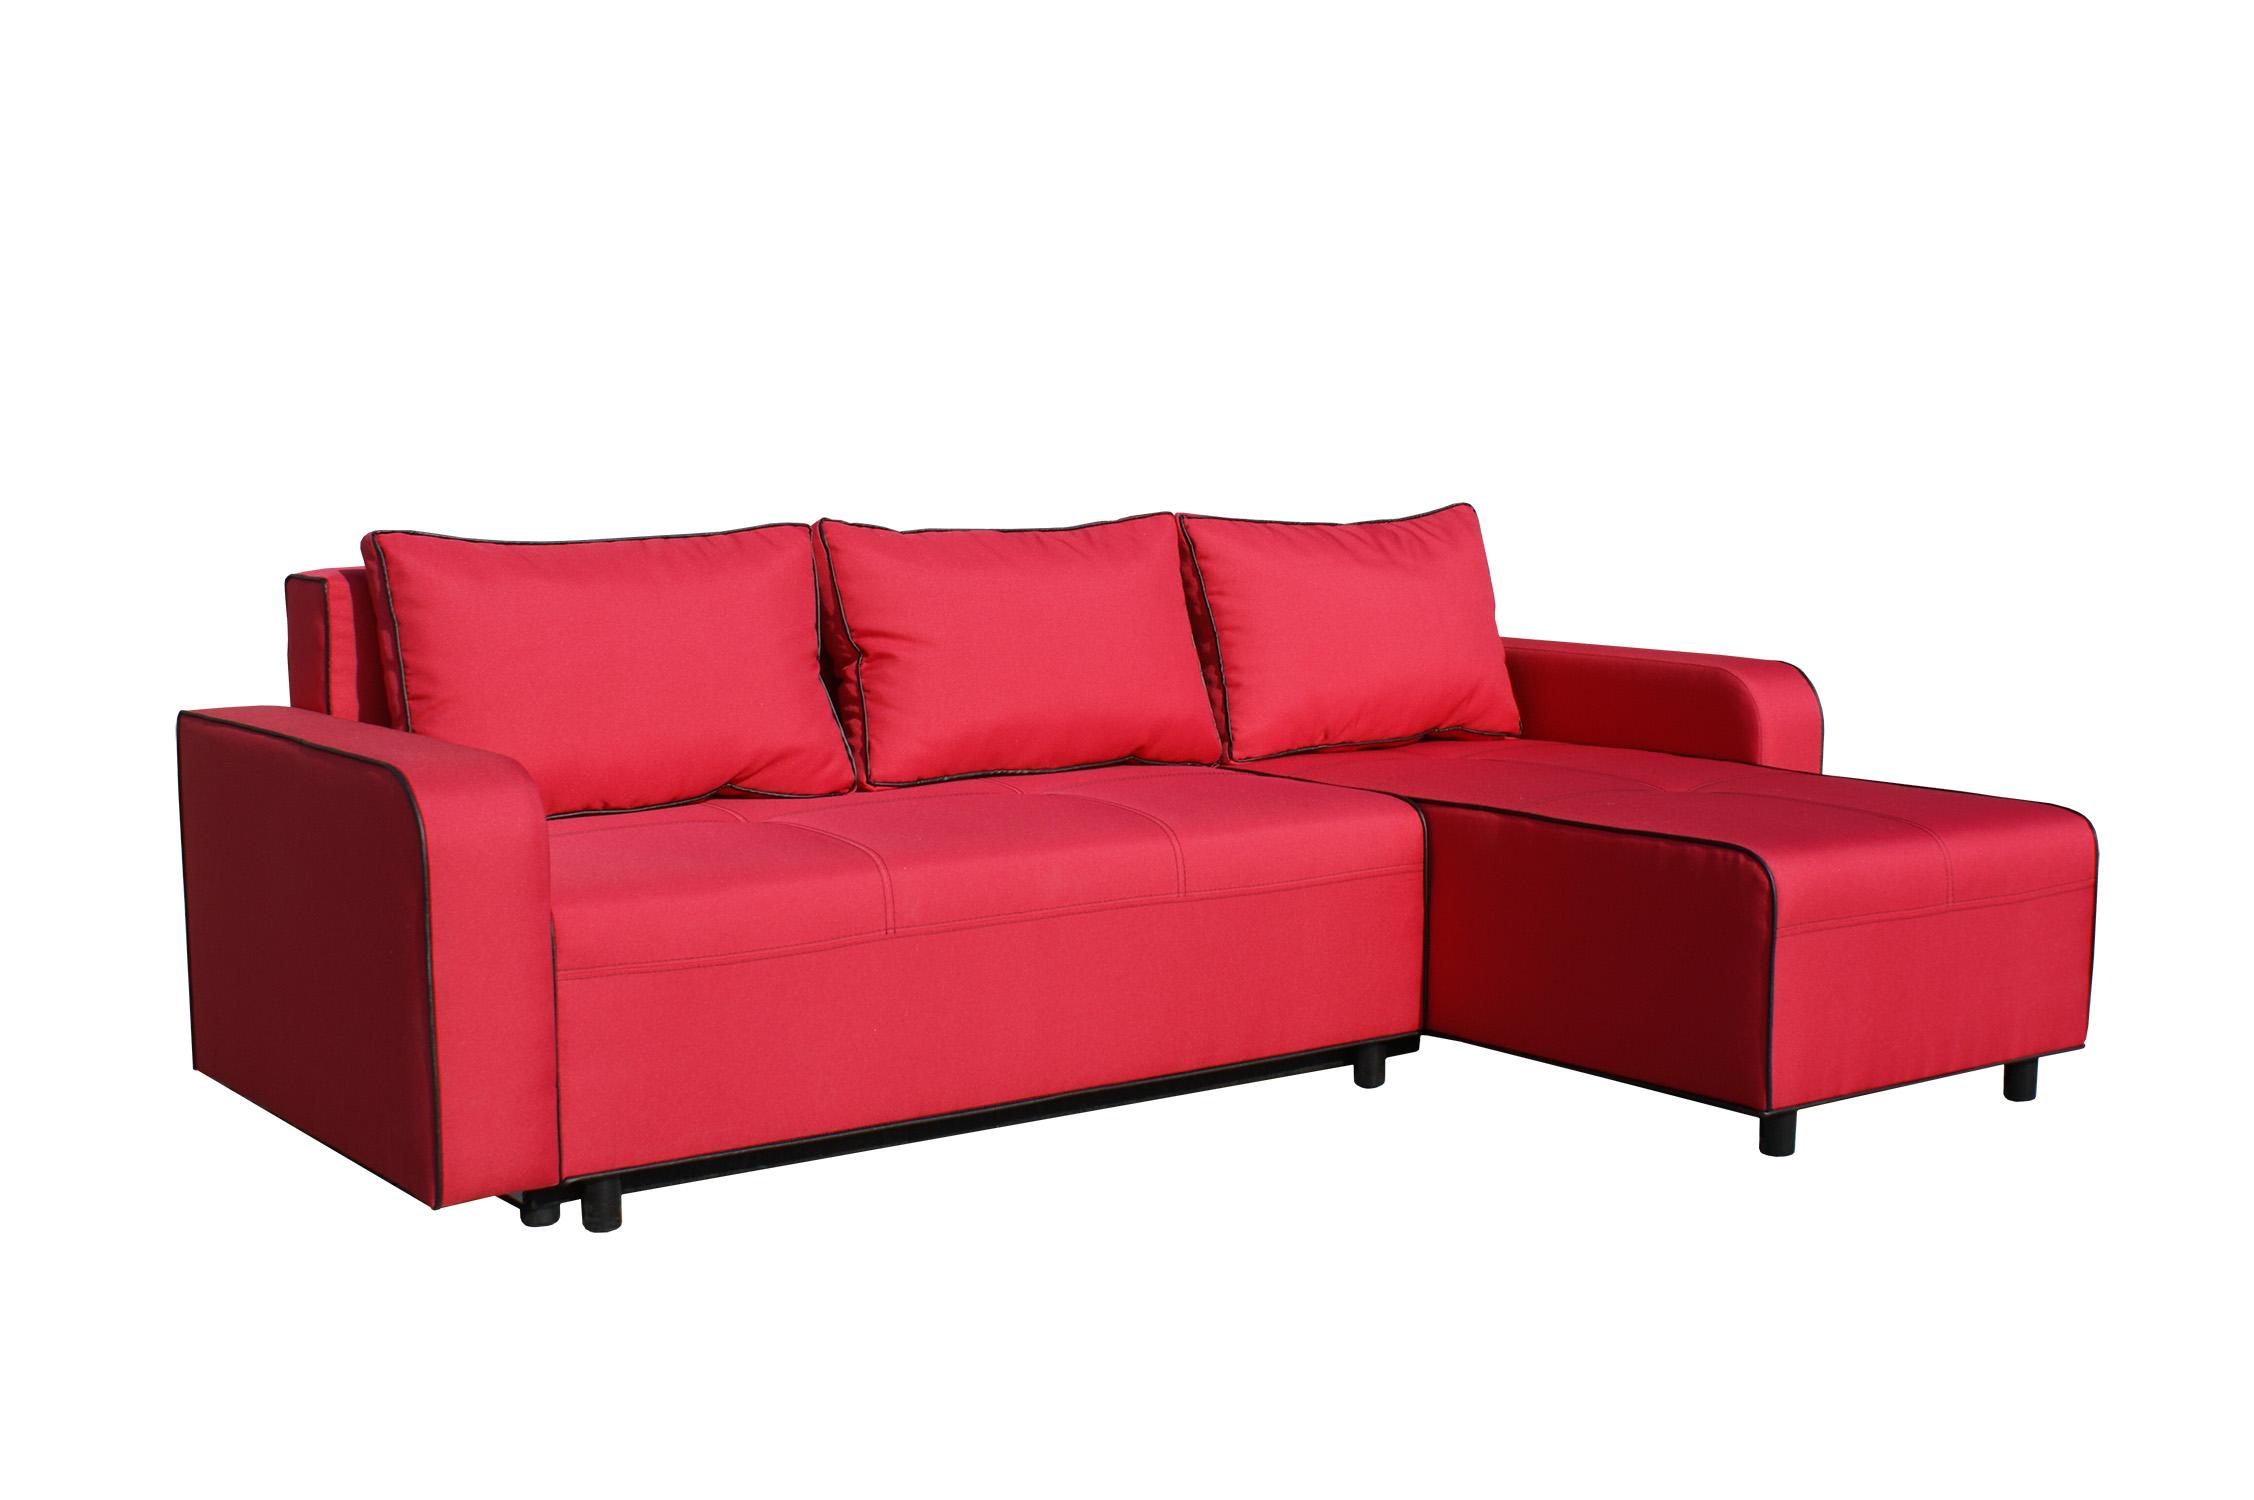 Rohová sedací souprava - BRW - Black 2 (červená) (P)